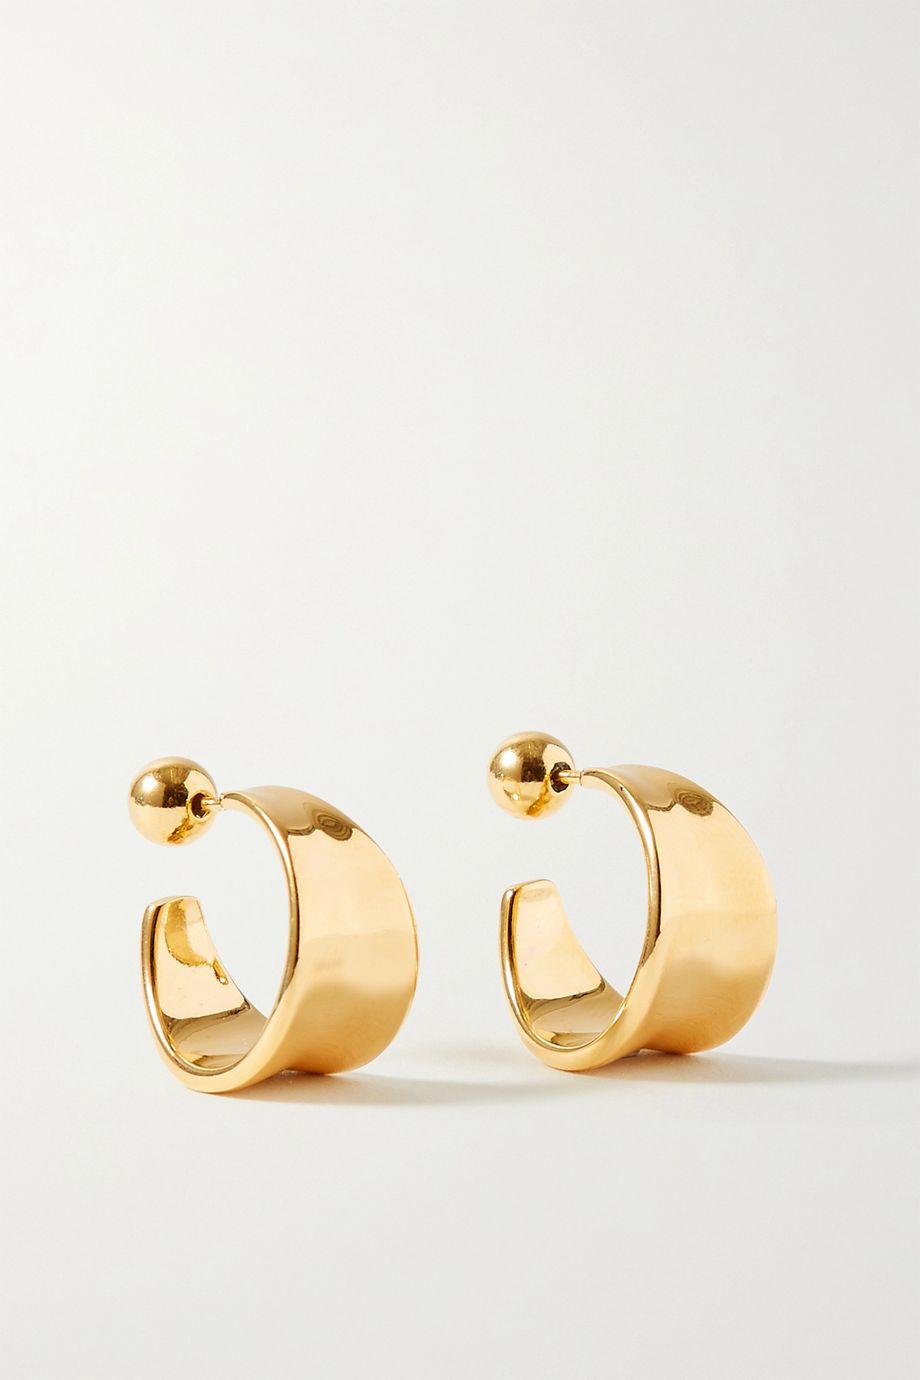 Sophie Buhai + NET SUSTAIN gold vermeil earrings